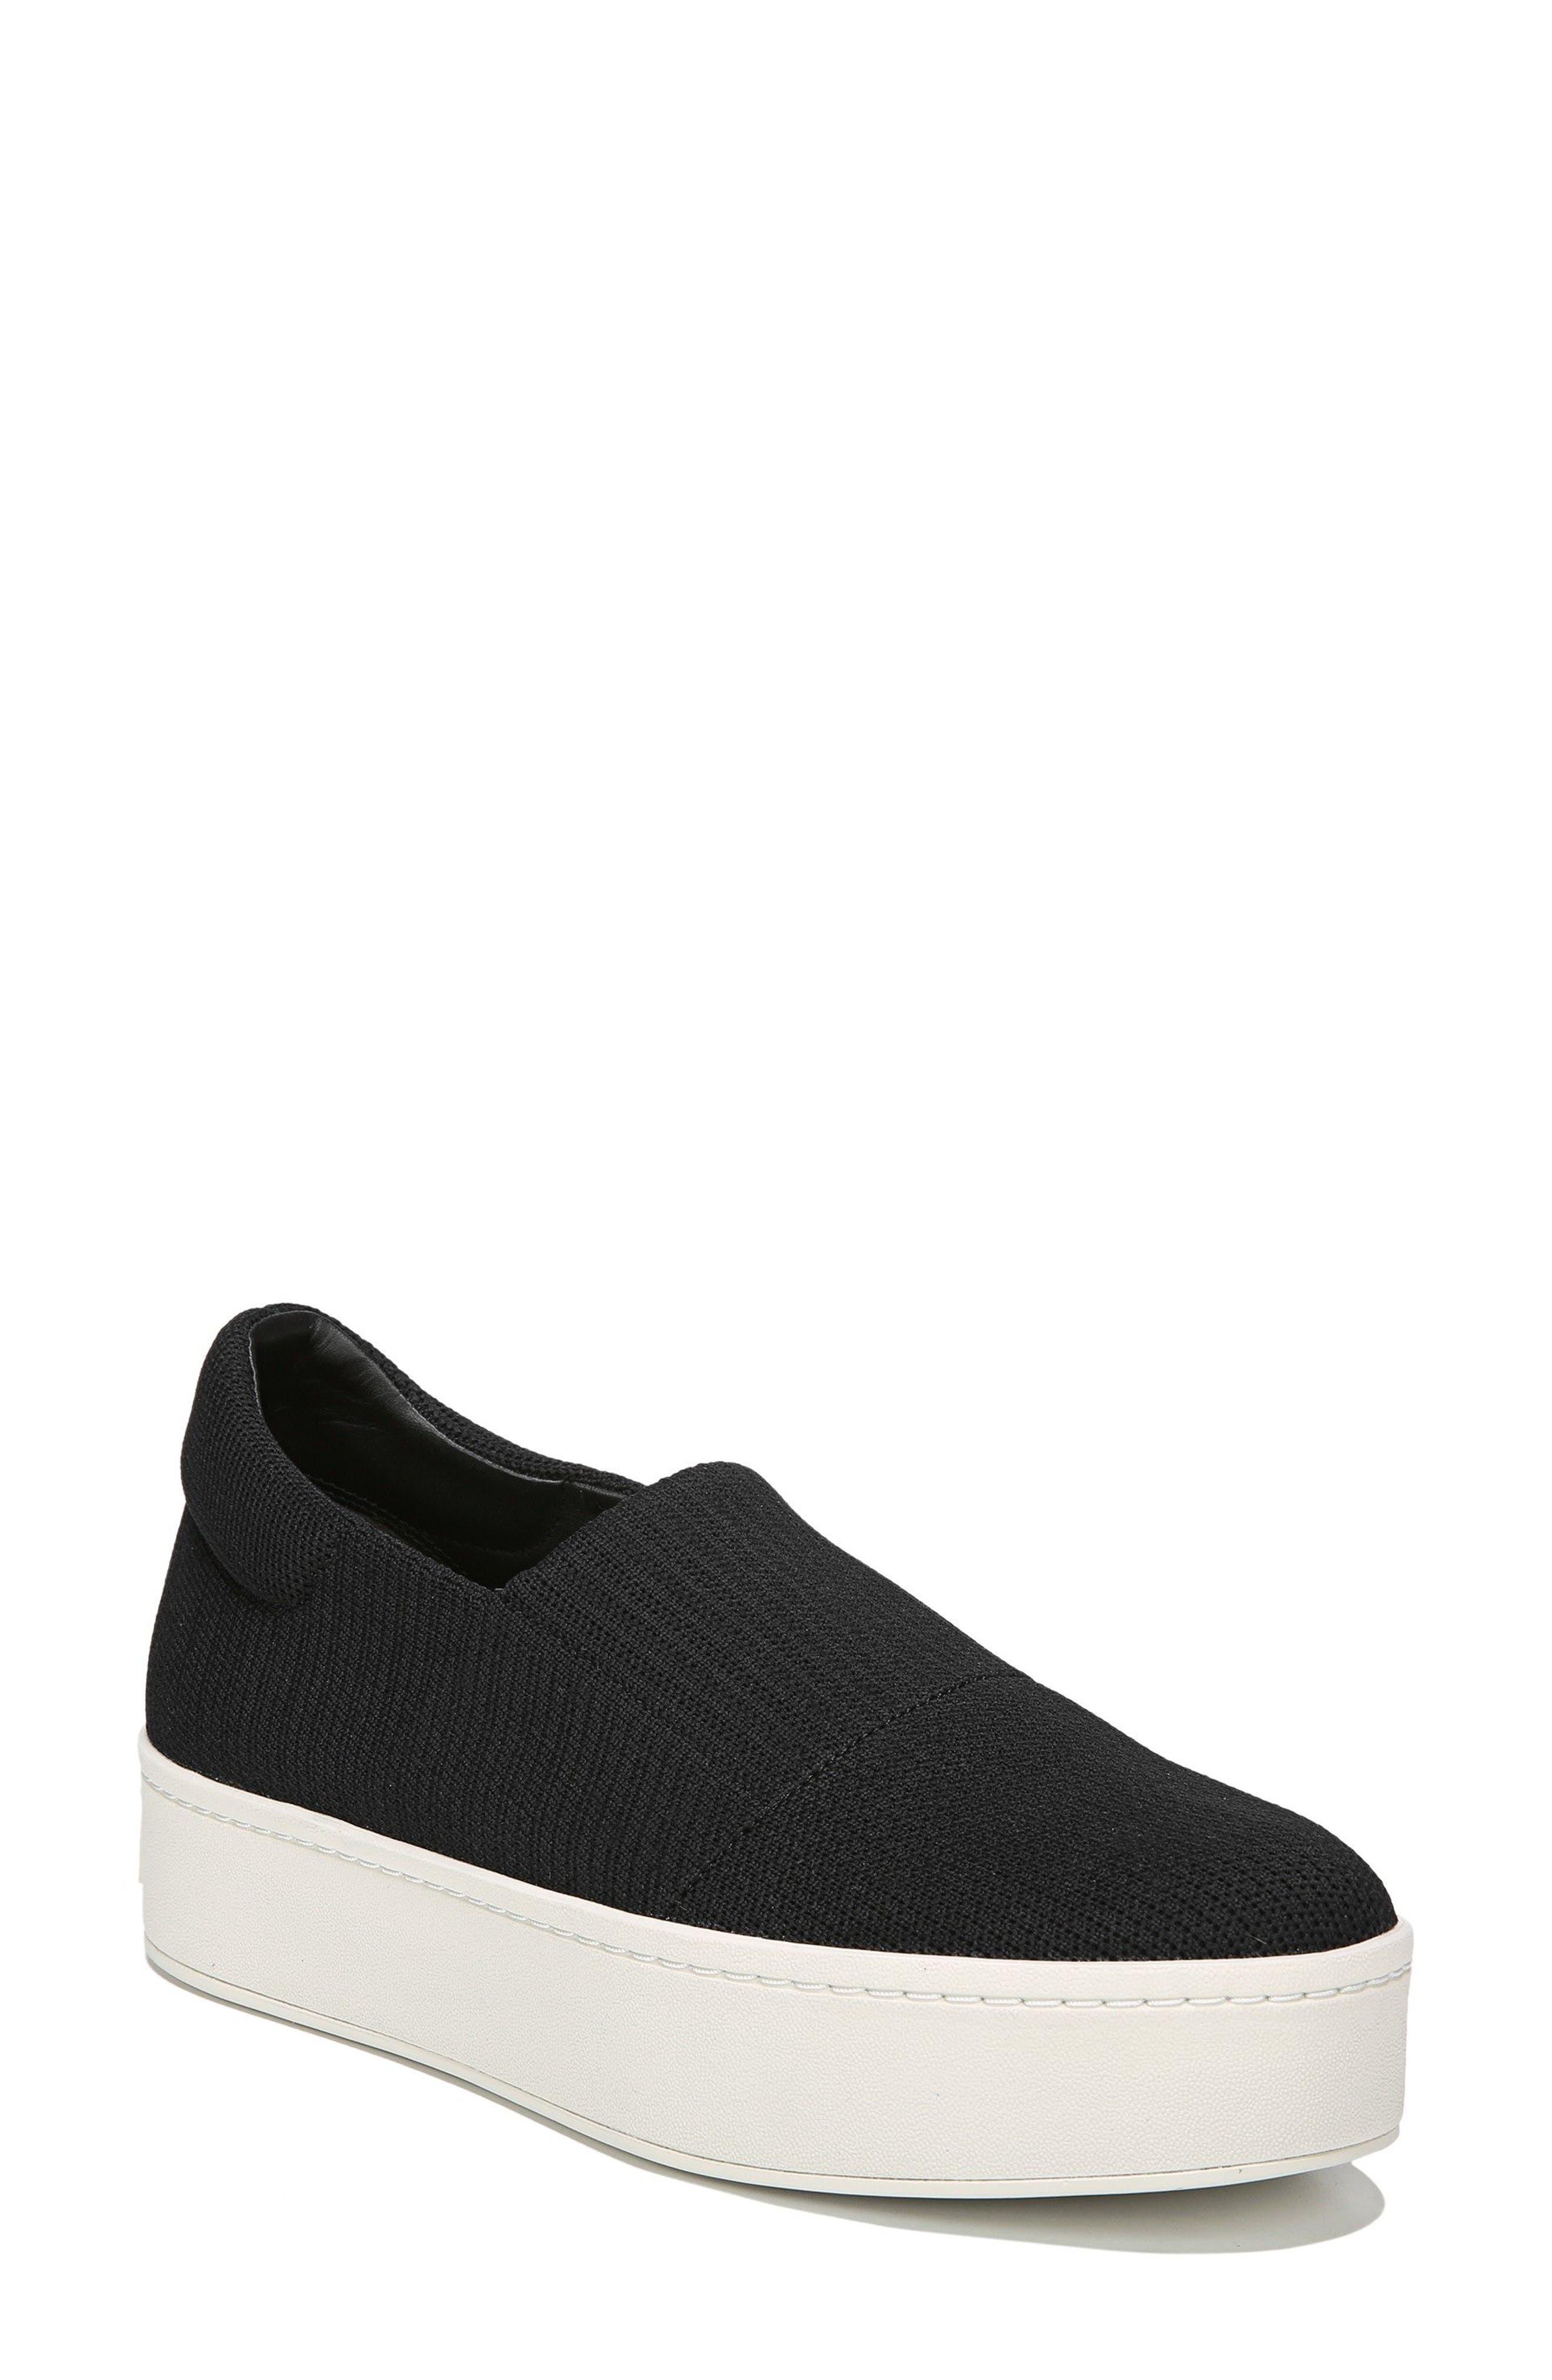 Walsh Slip-On Sneaker,                             Main thumbnail 1, color,                             Black